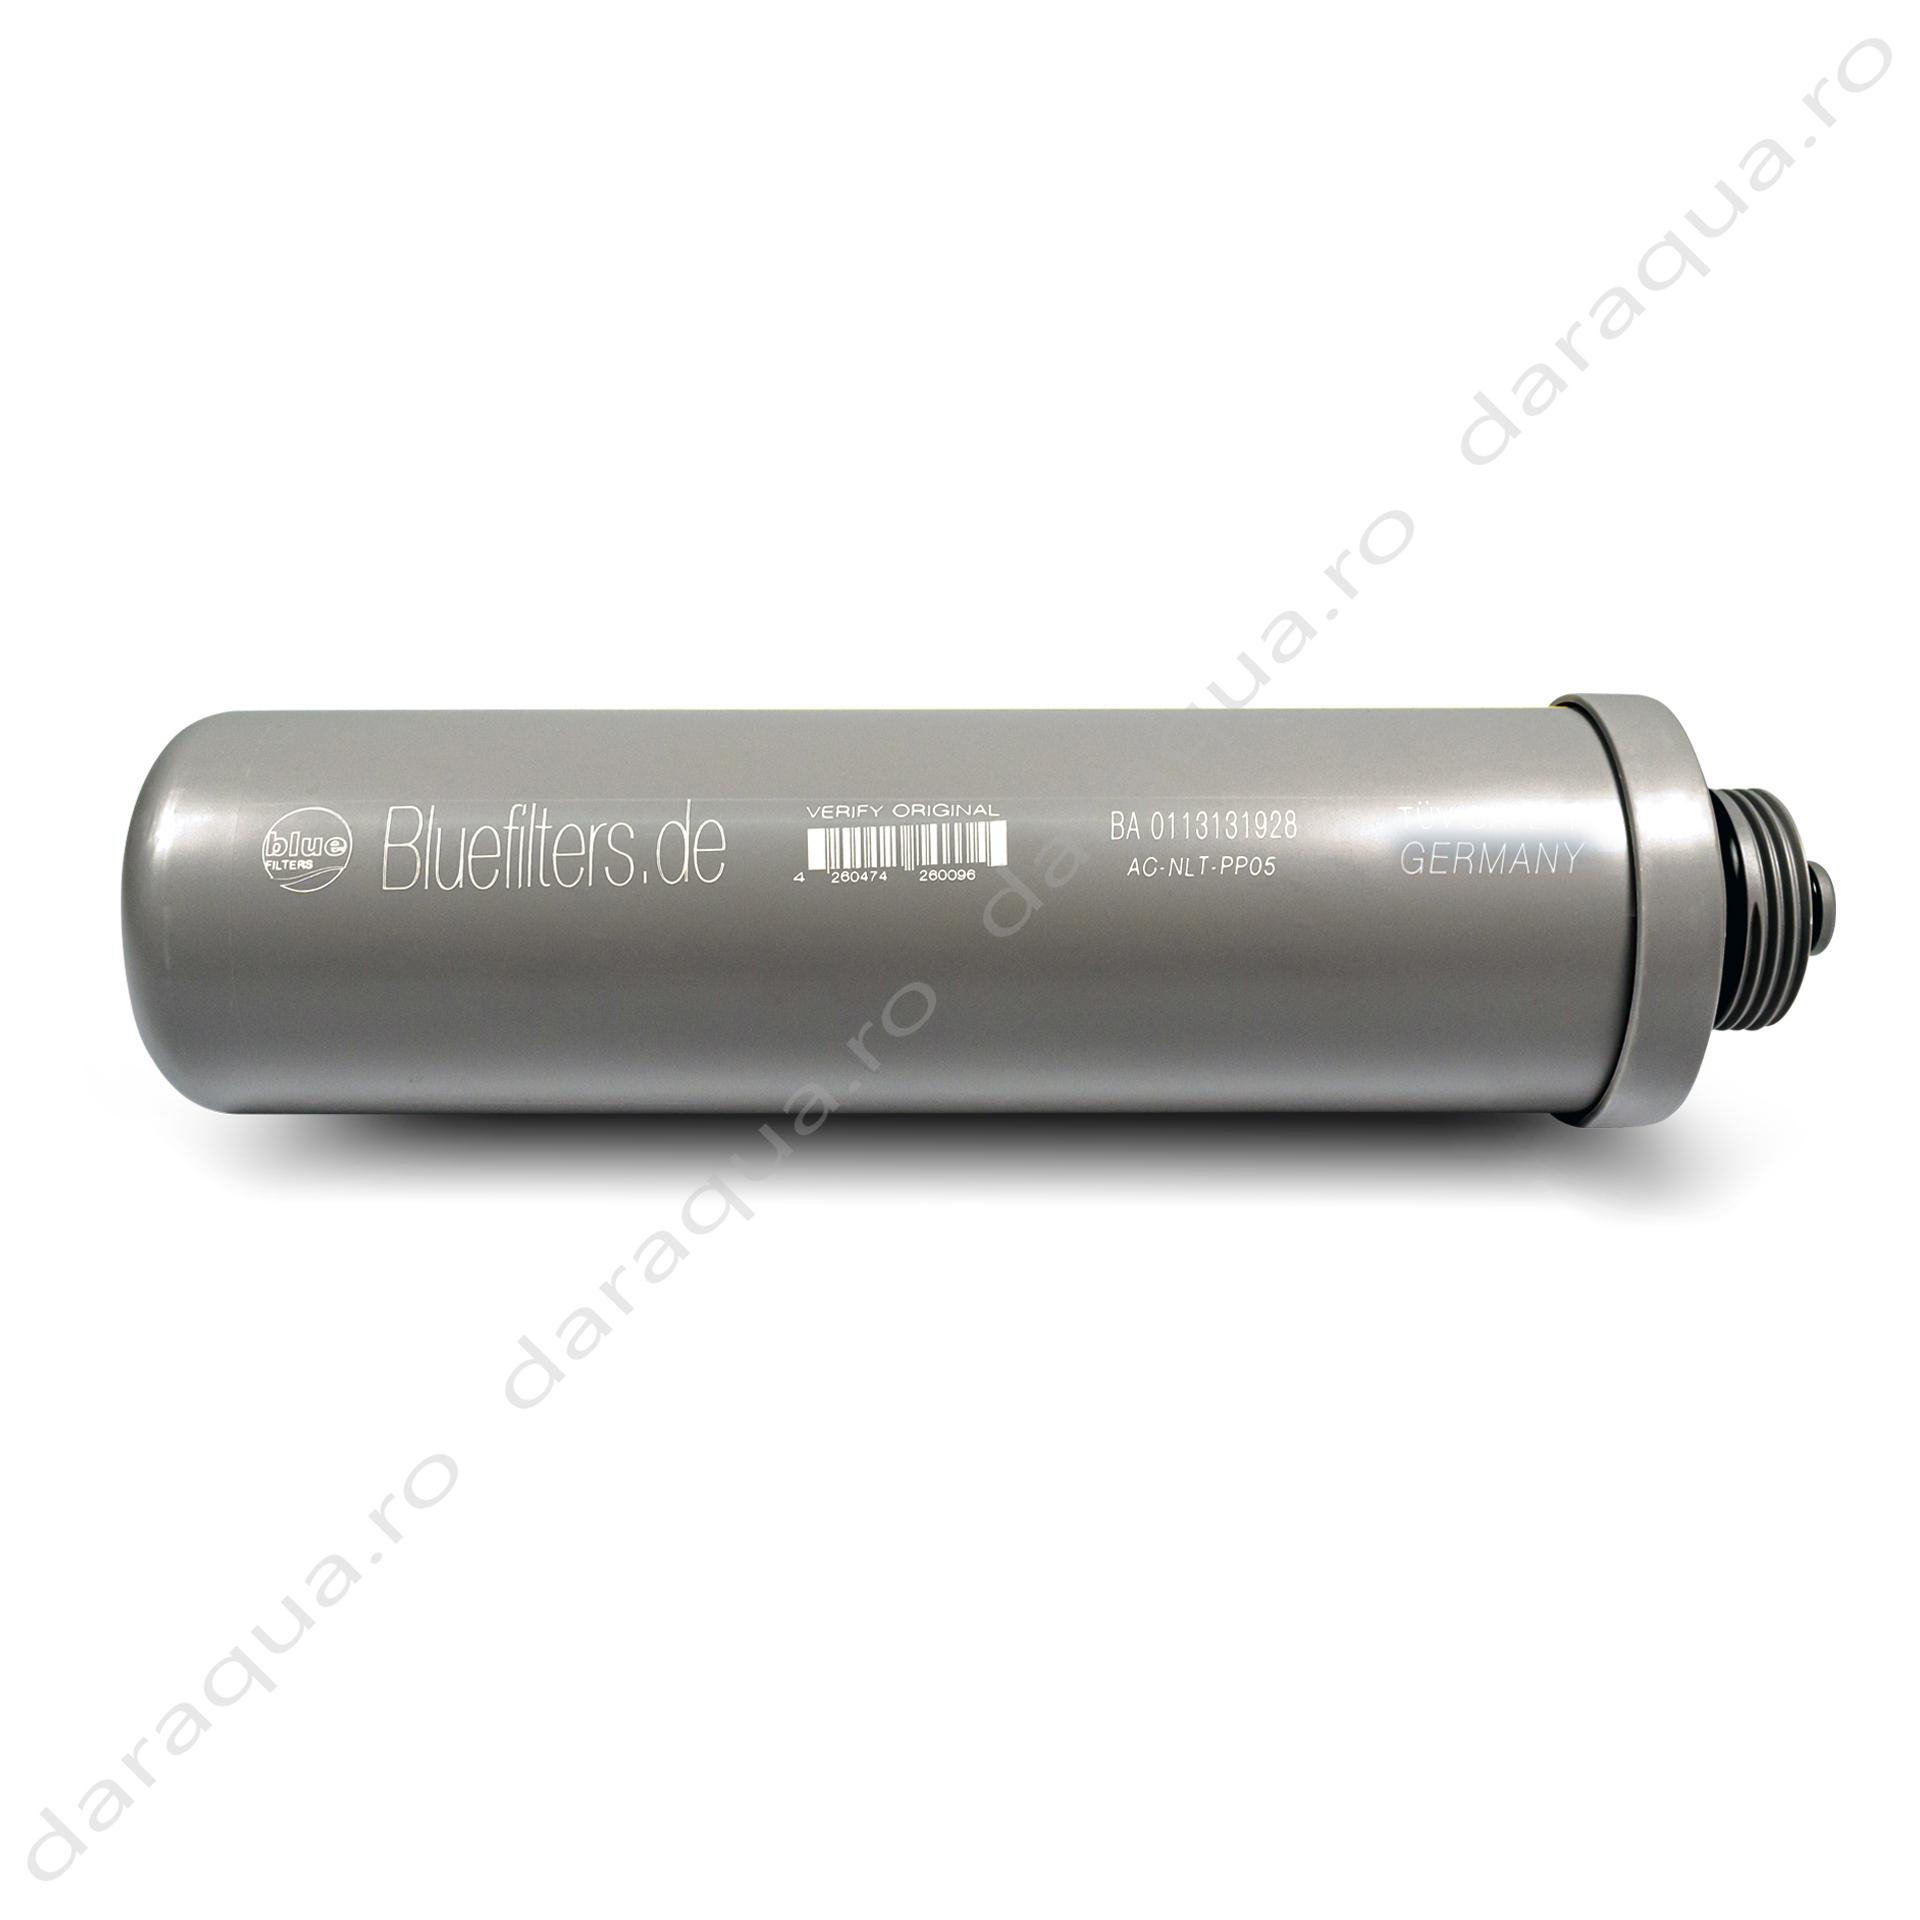 Filtru AC-PP-10-5-NL